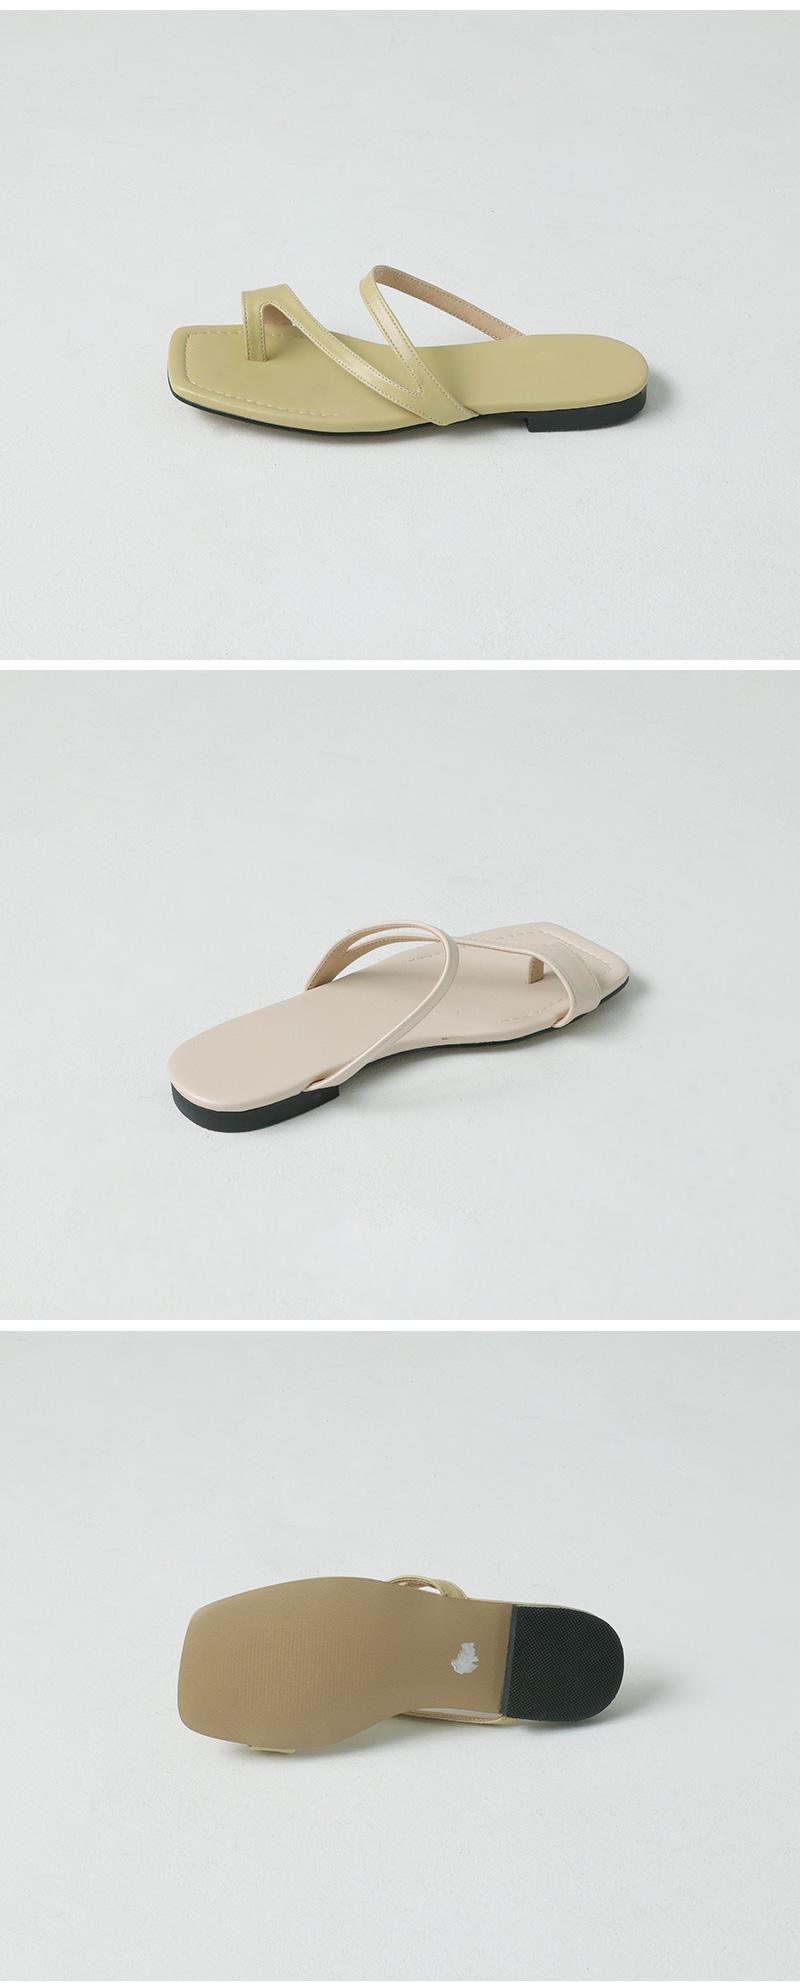 Daily Point Toe Slipper